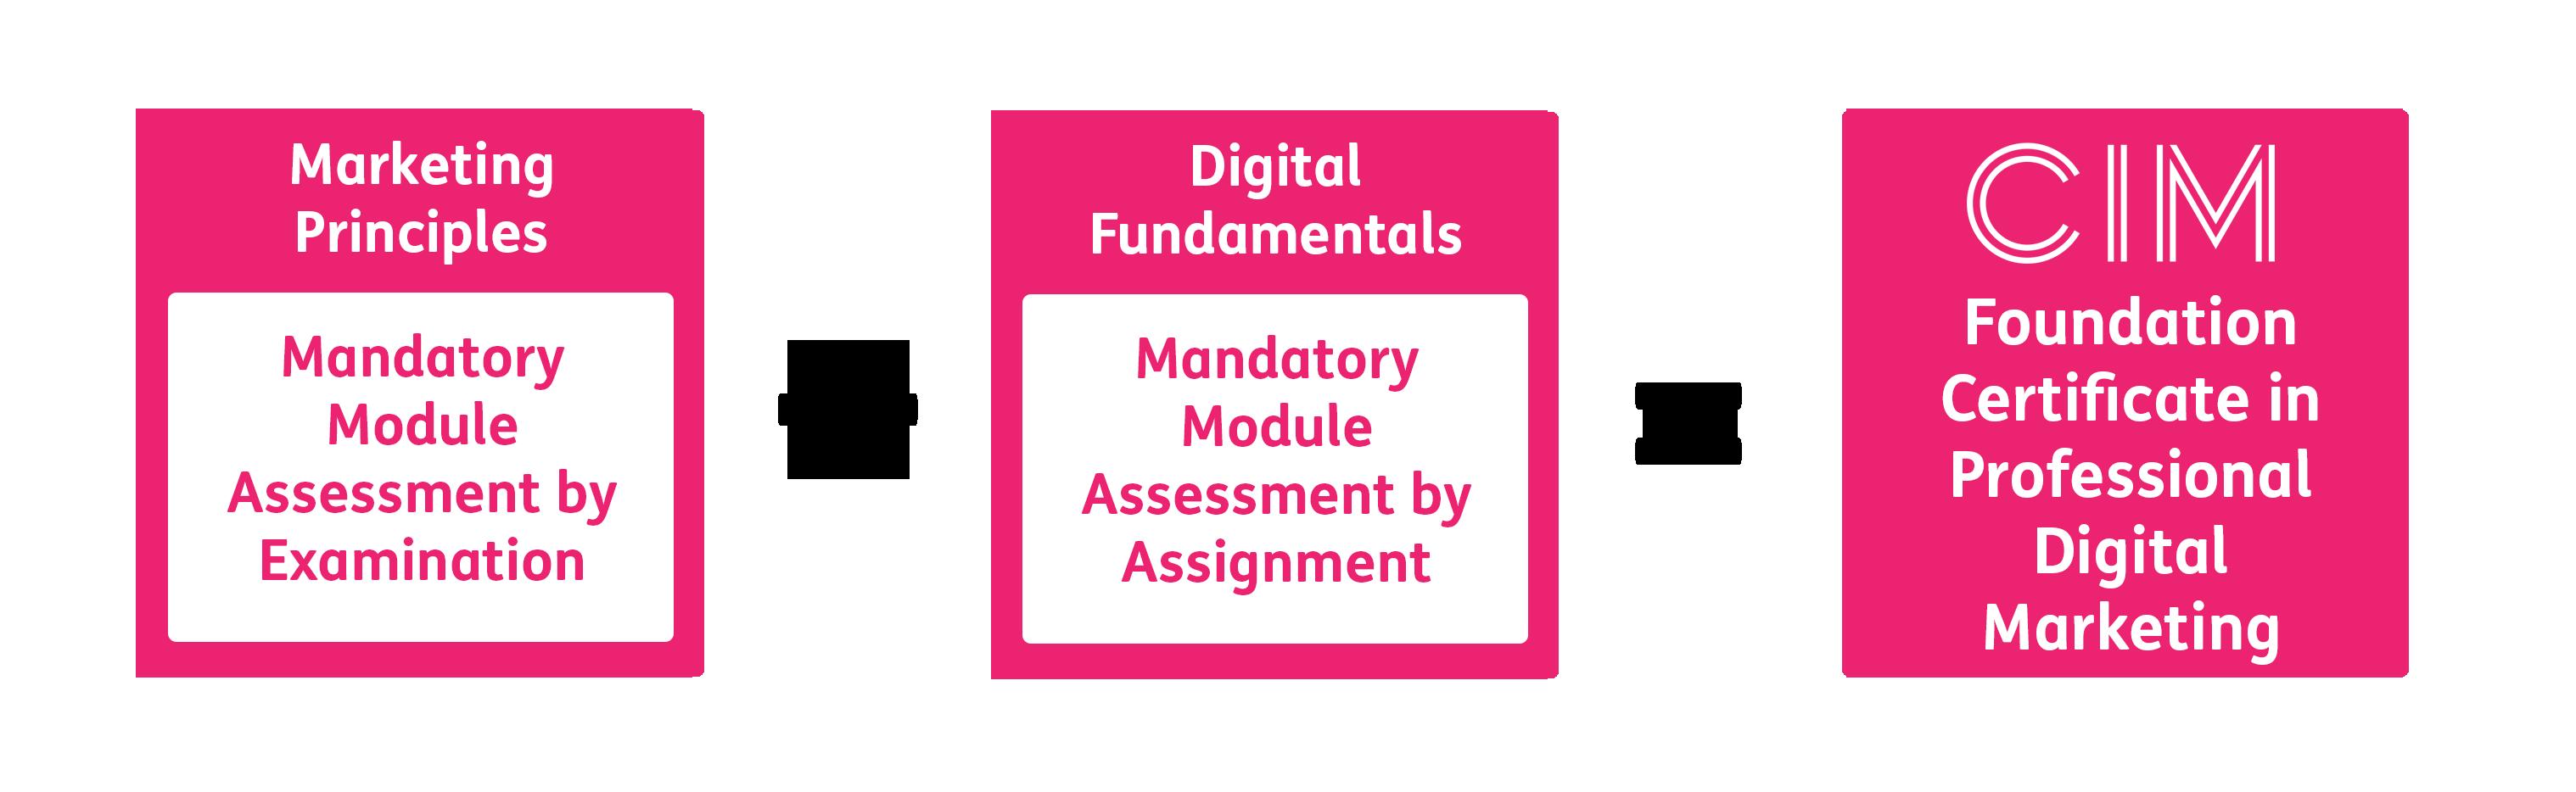 CIM Foundation Certificate in Professional Digital Marketing Structure